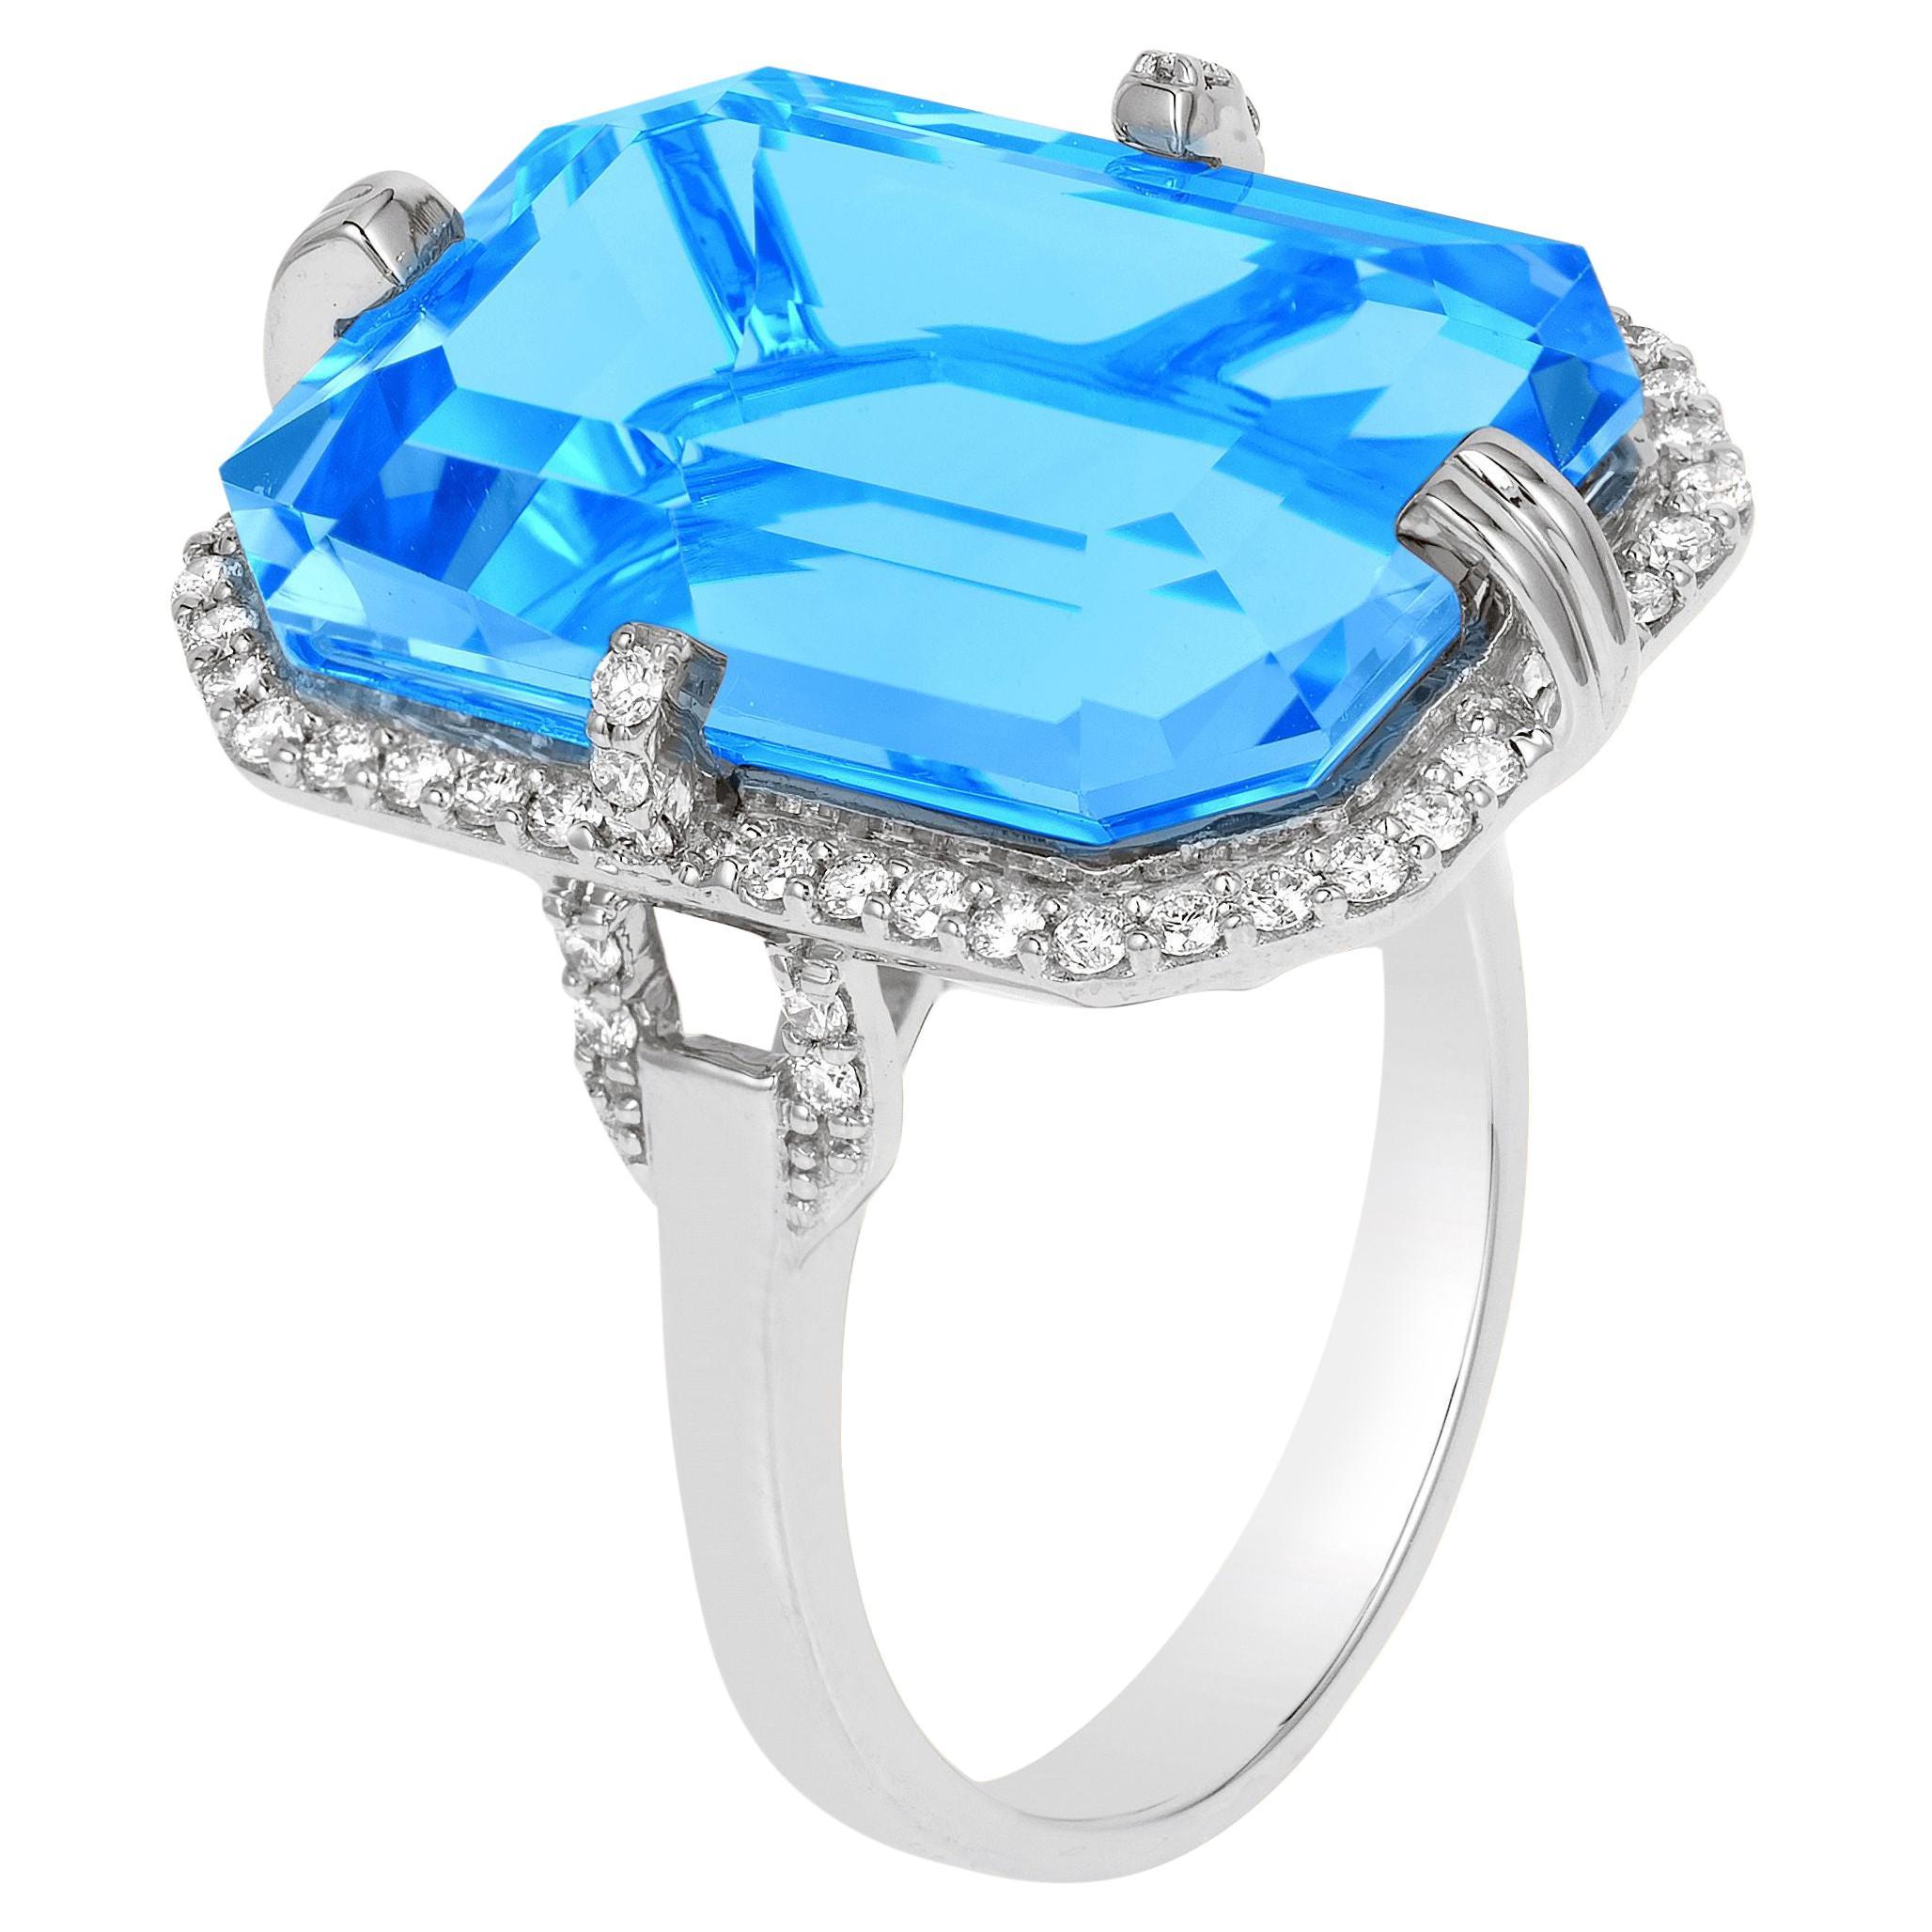 Goshwara Blue Topaz with Diamonds Ring